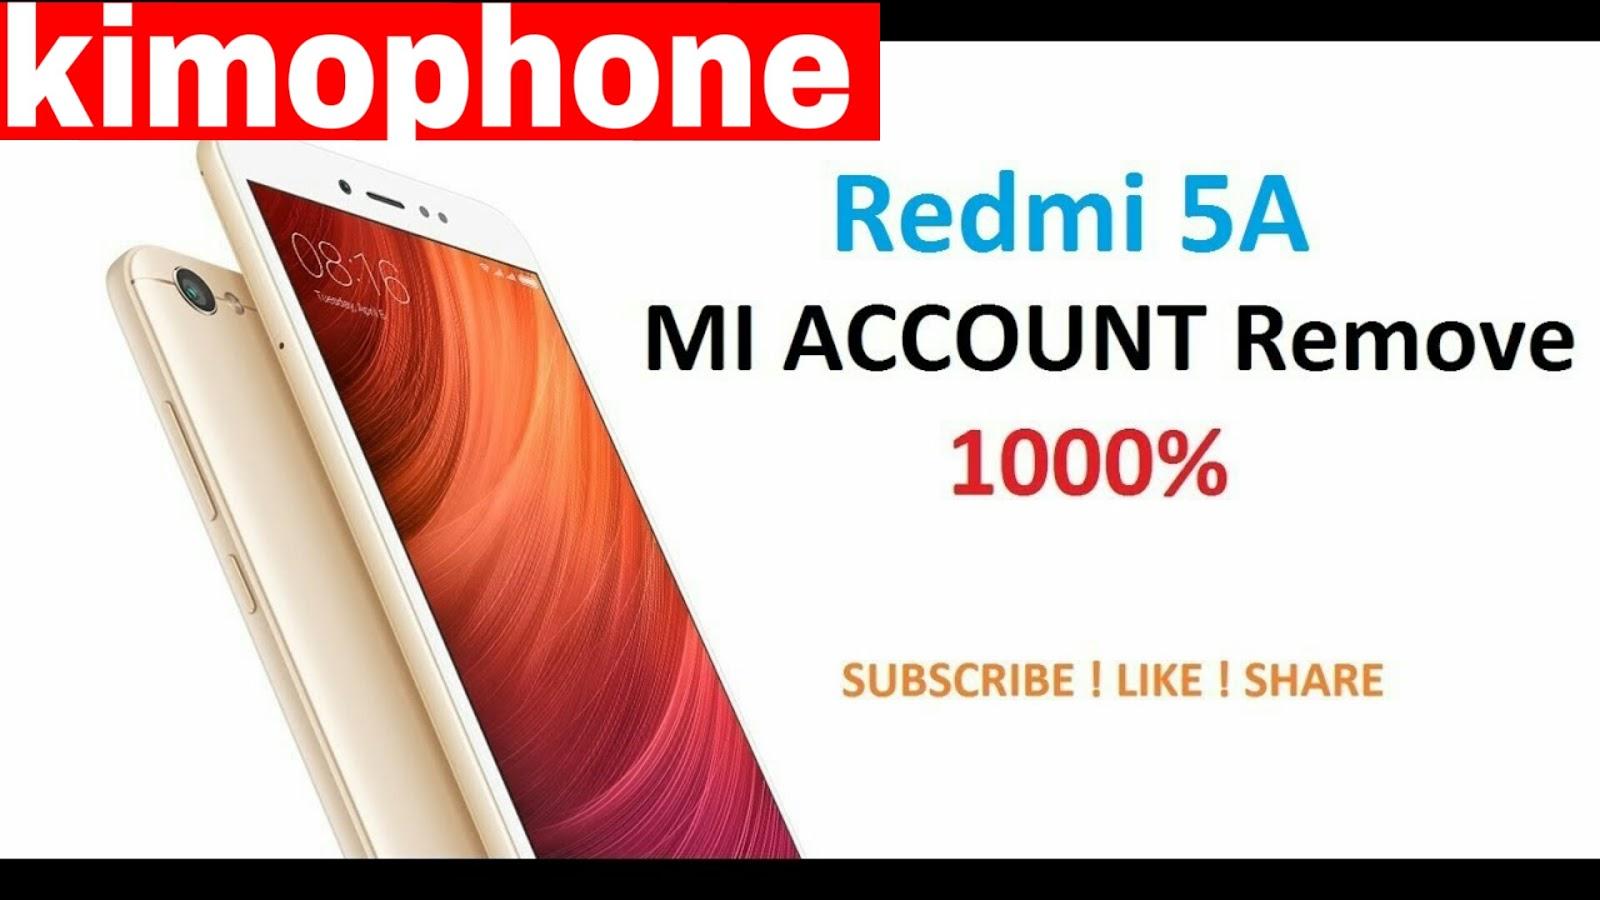 Redmi 5A Mi Account Remove All Miui 9 Mi Account Bypass withe